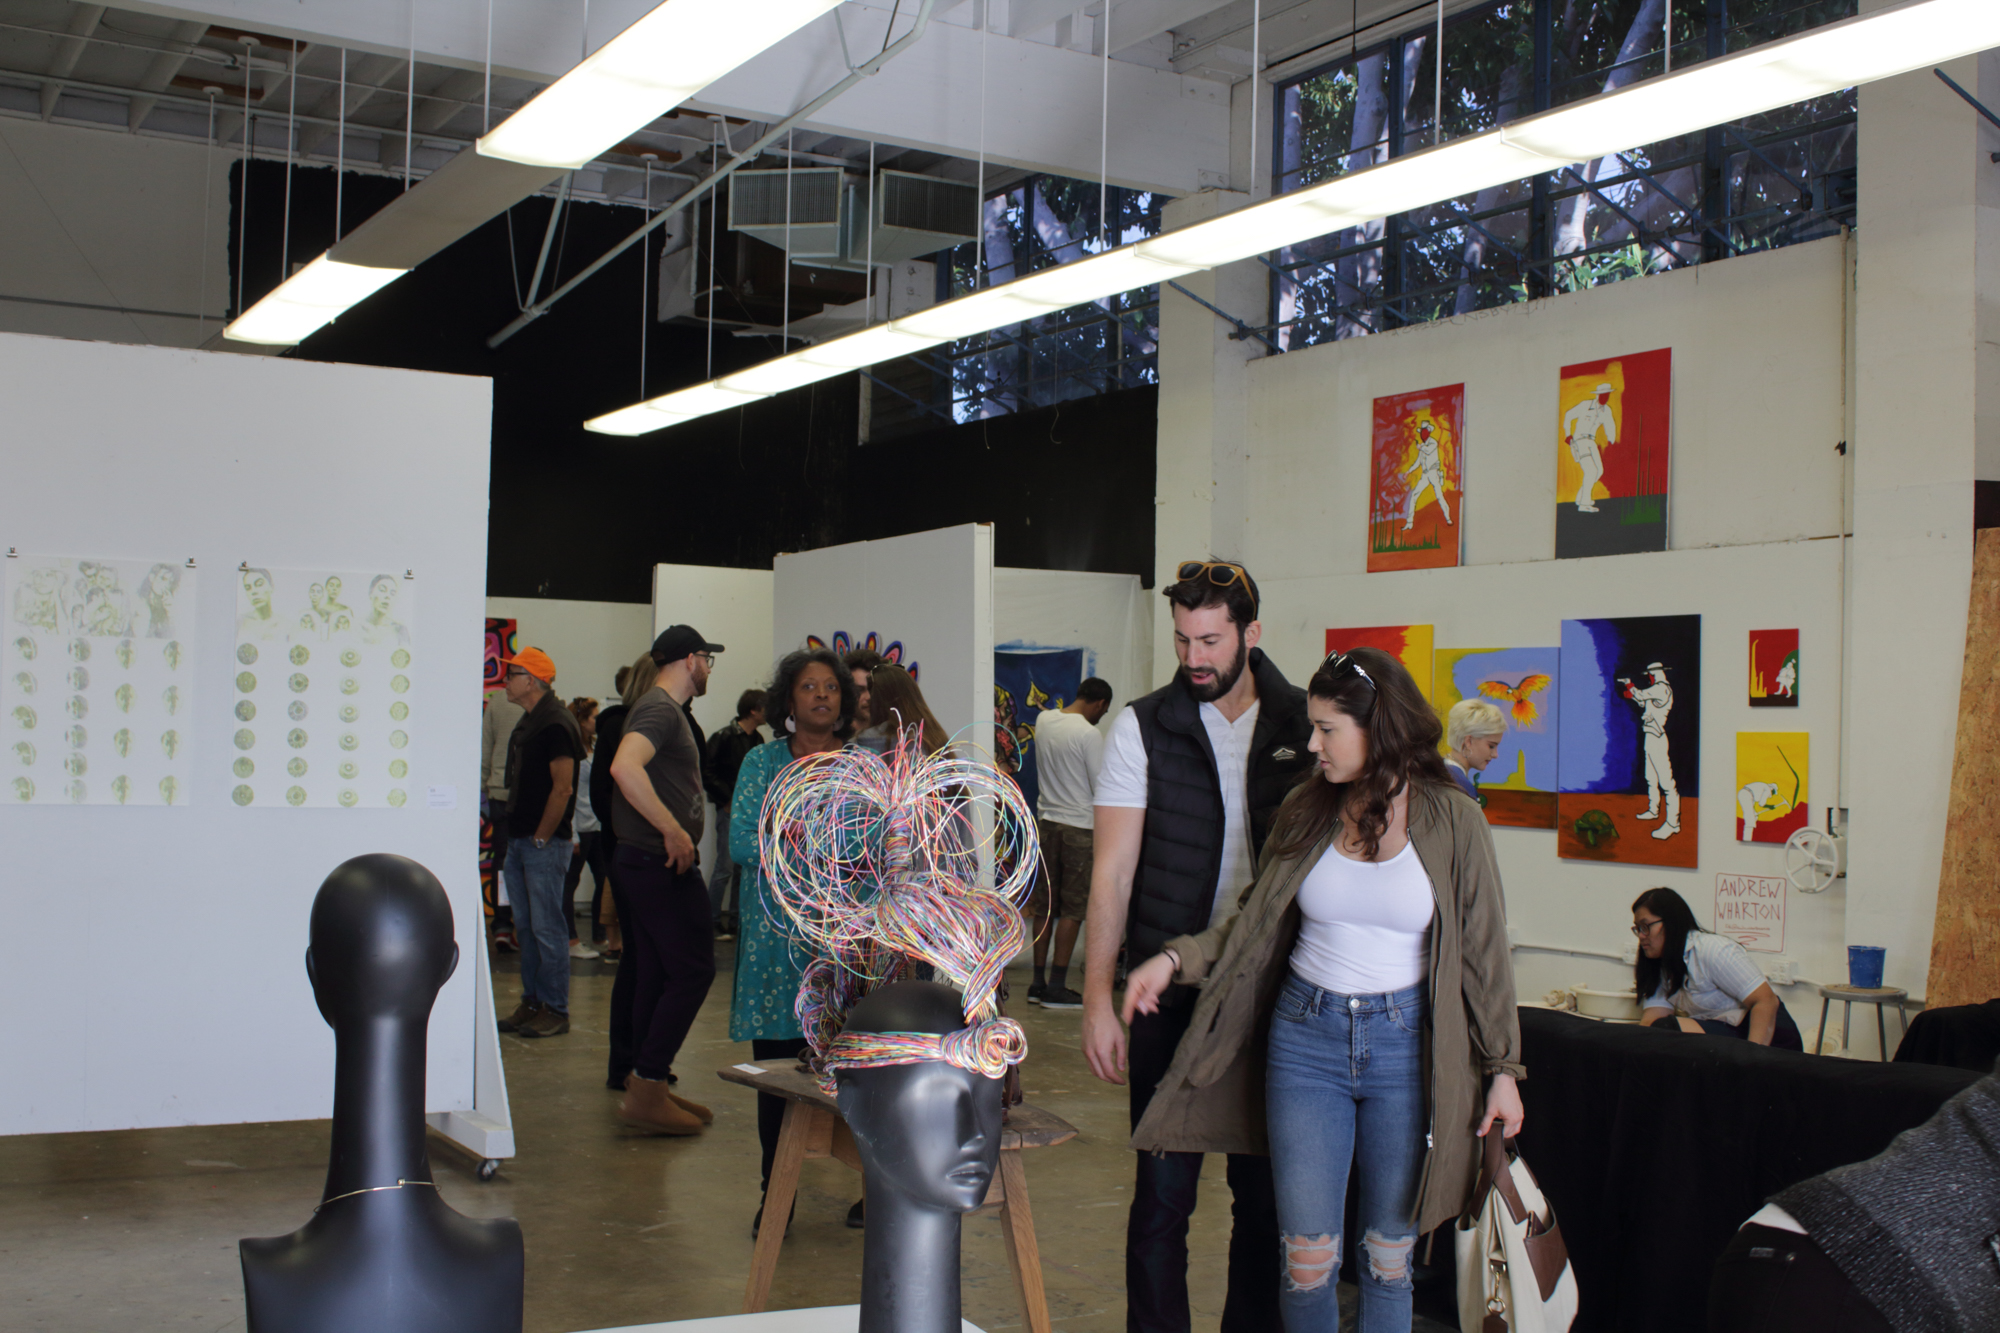 Spectators walk through the SMC Art Mentor Program gallery, mentored by Christopher Badger, at the 12 Annual Santa Monica ArtWalk on March 24th, 2018 in Santa Monica, California. (Heather Creamer/ Corsair Photo)..